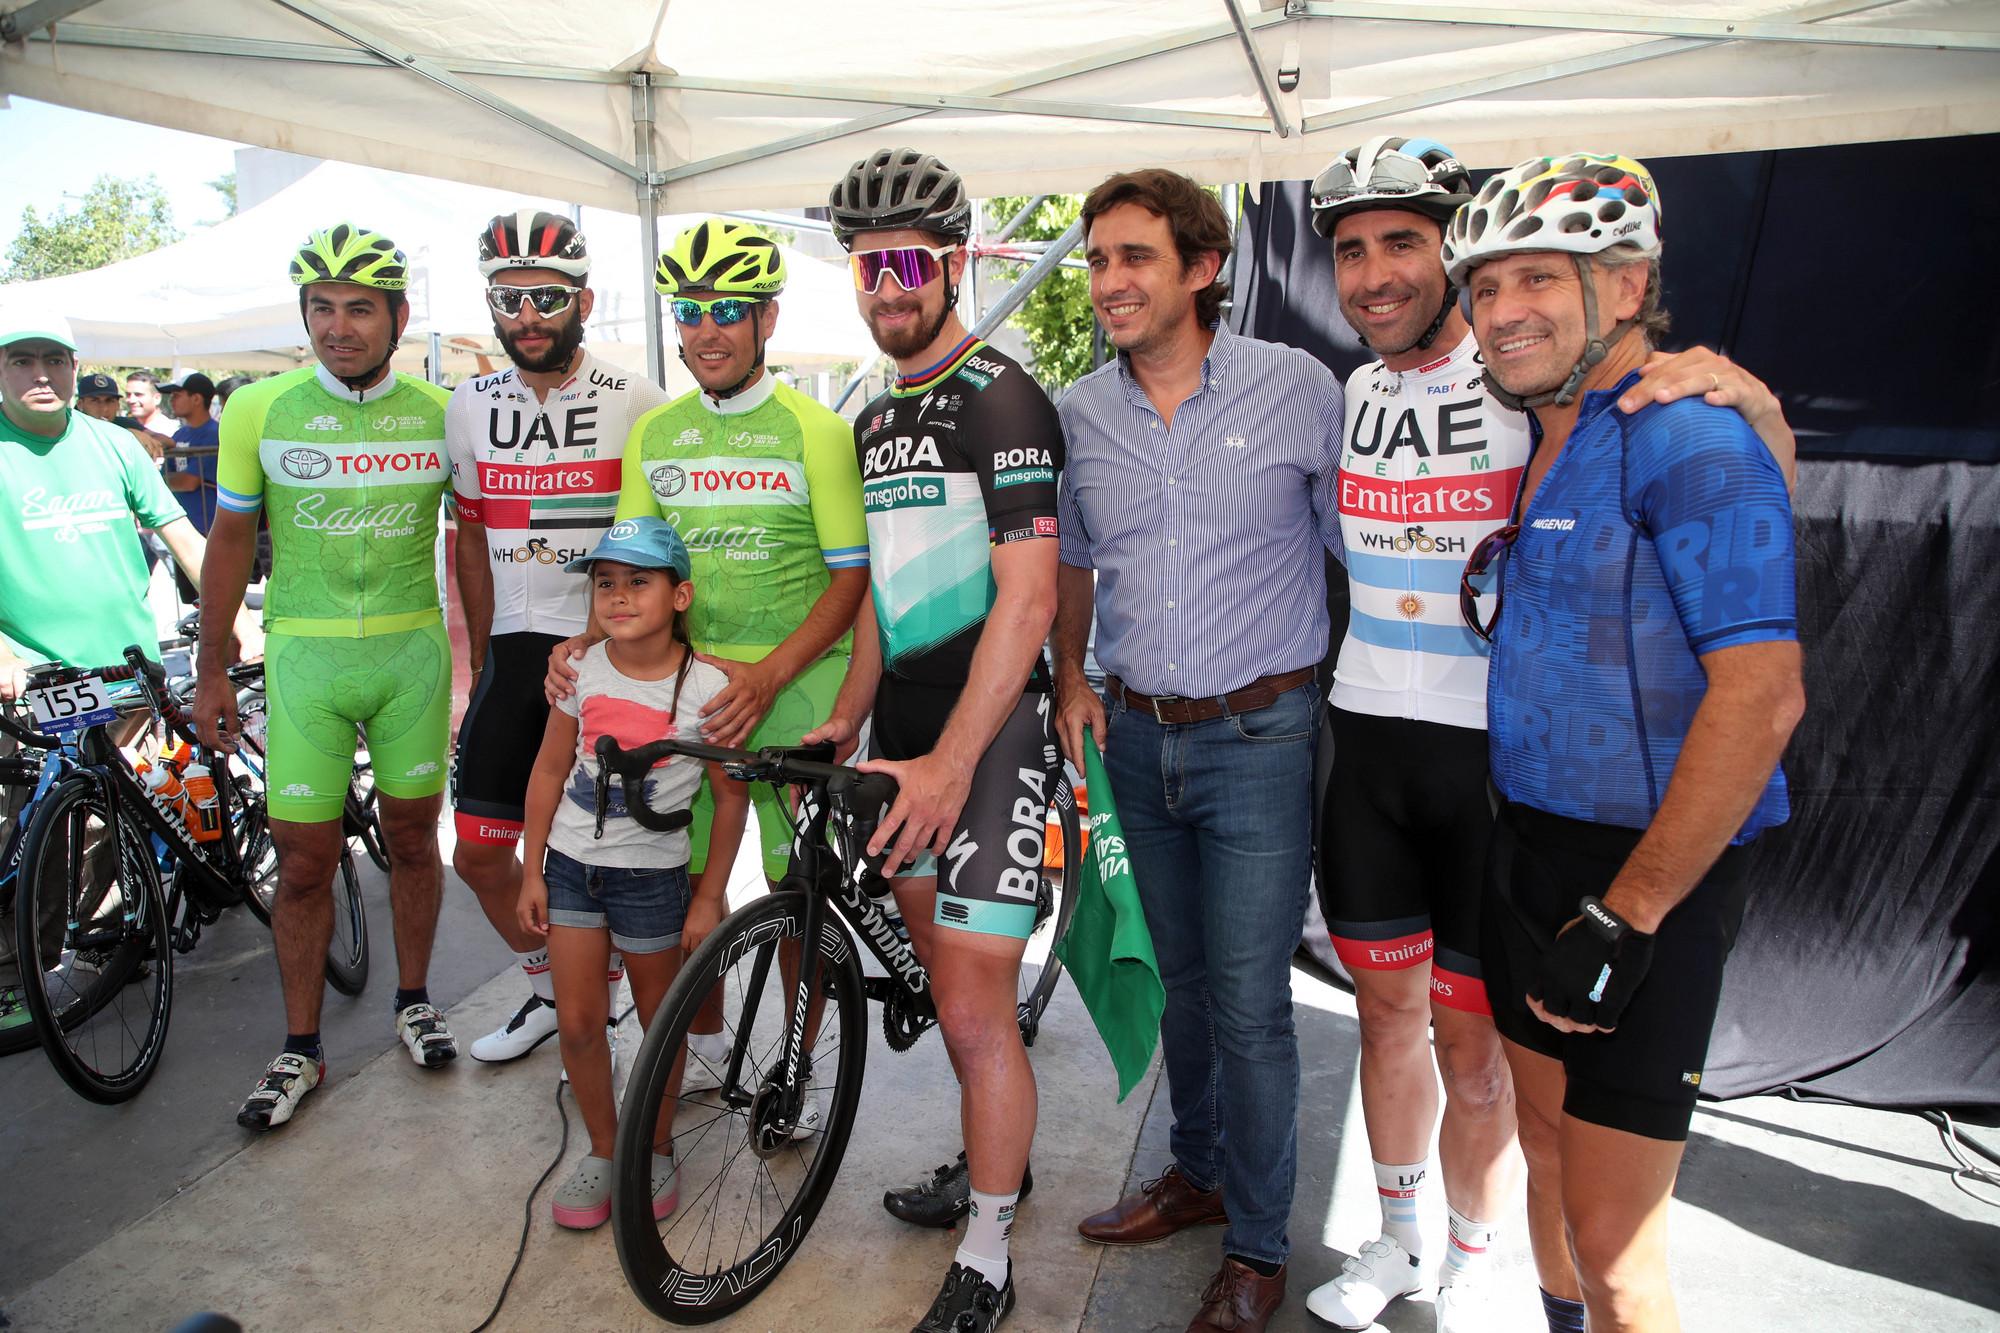 Fernando Gaviria, Max Richeze and Peter Sagan